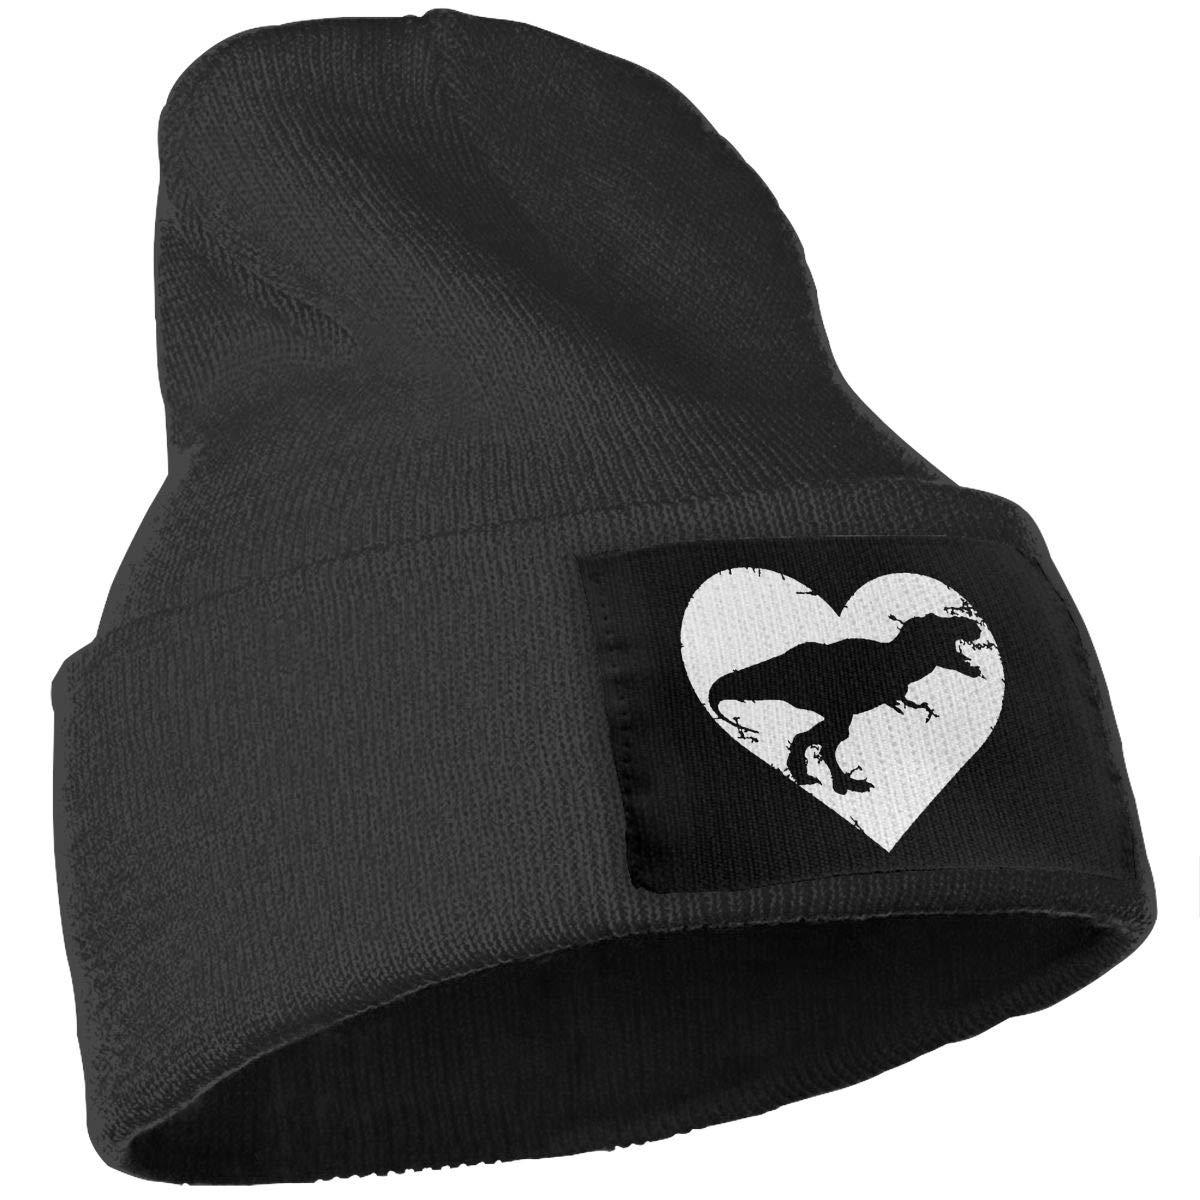 Men /& Women Funny Cute T Rex Dinosaur Heart Outdoor Fashion Knit Beanies Hat Soft Winter Knit Caps